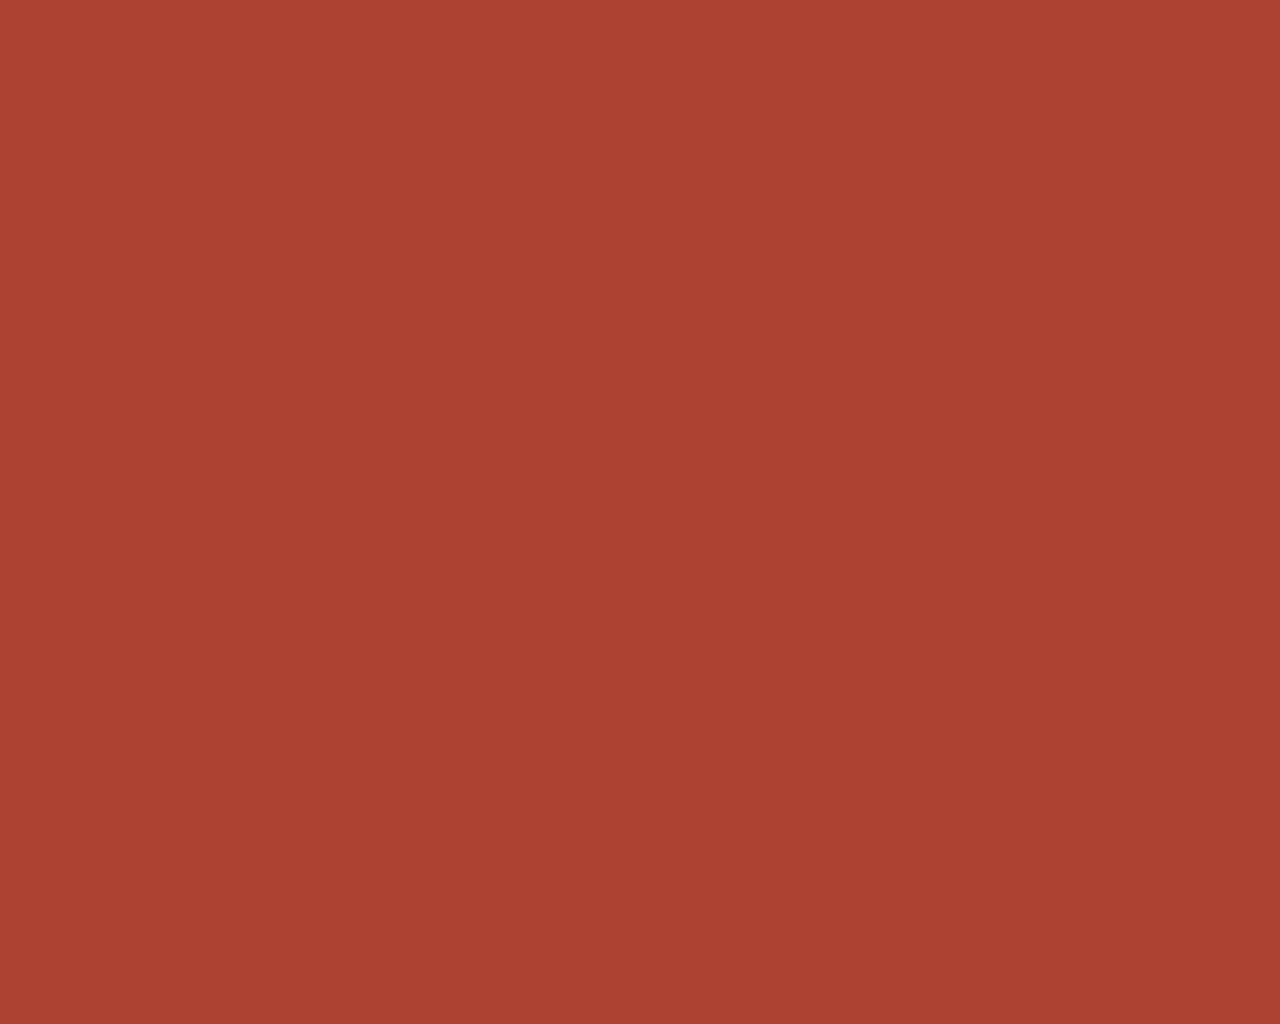 Fall Color Wallpaper For Desktop Sj71 Color Tycho Simple Red Orange Gradation Blur Wallpaper